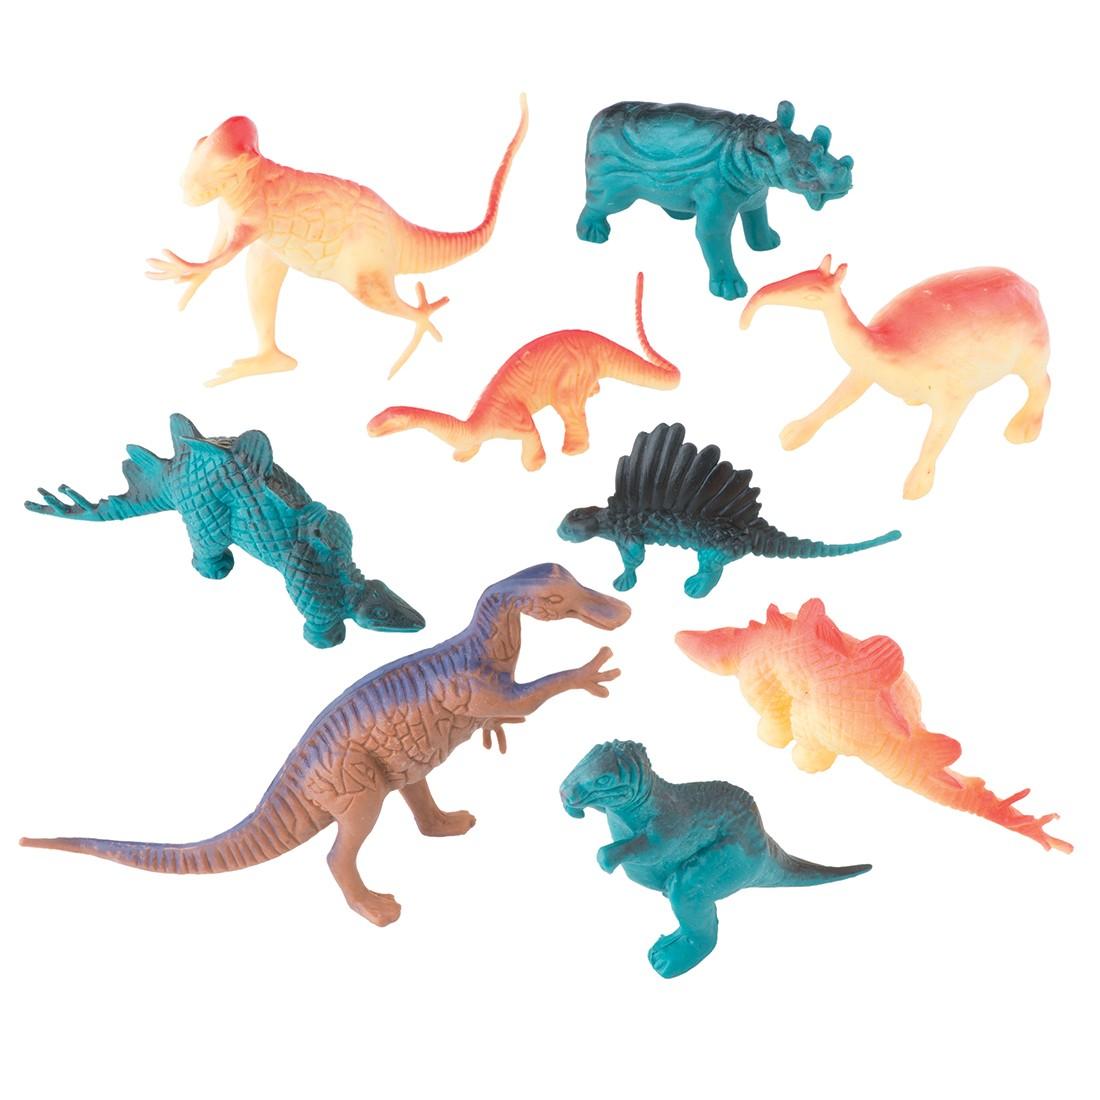 Dinosaurs [image]